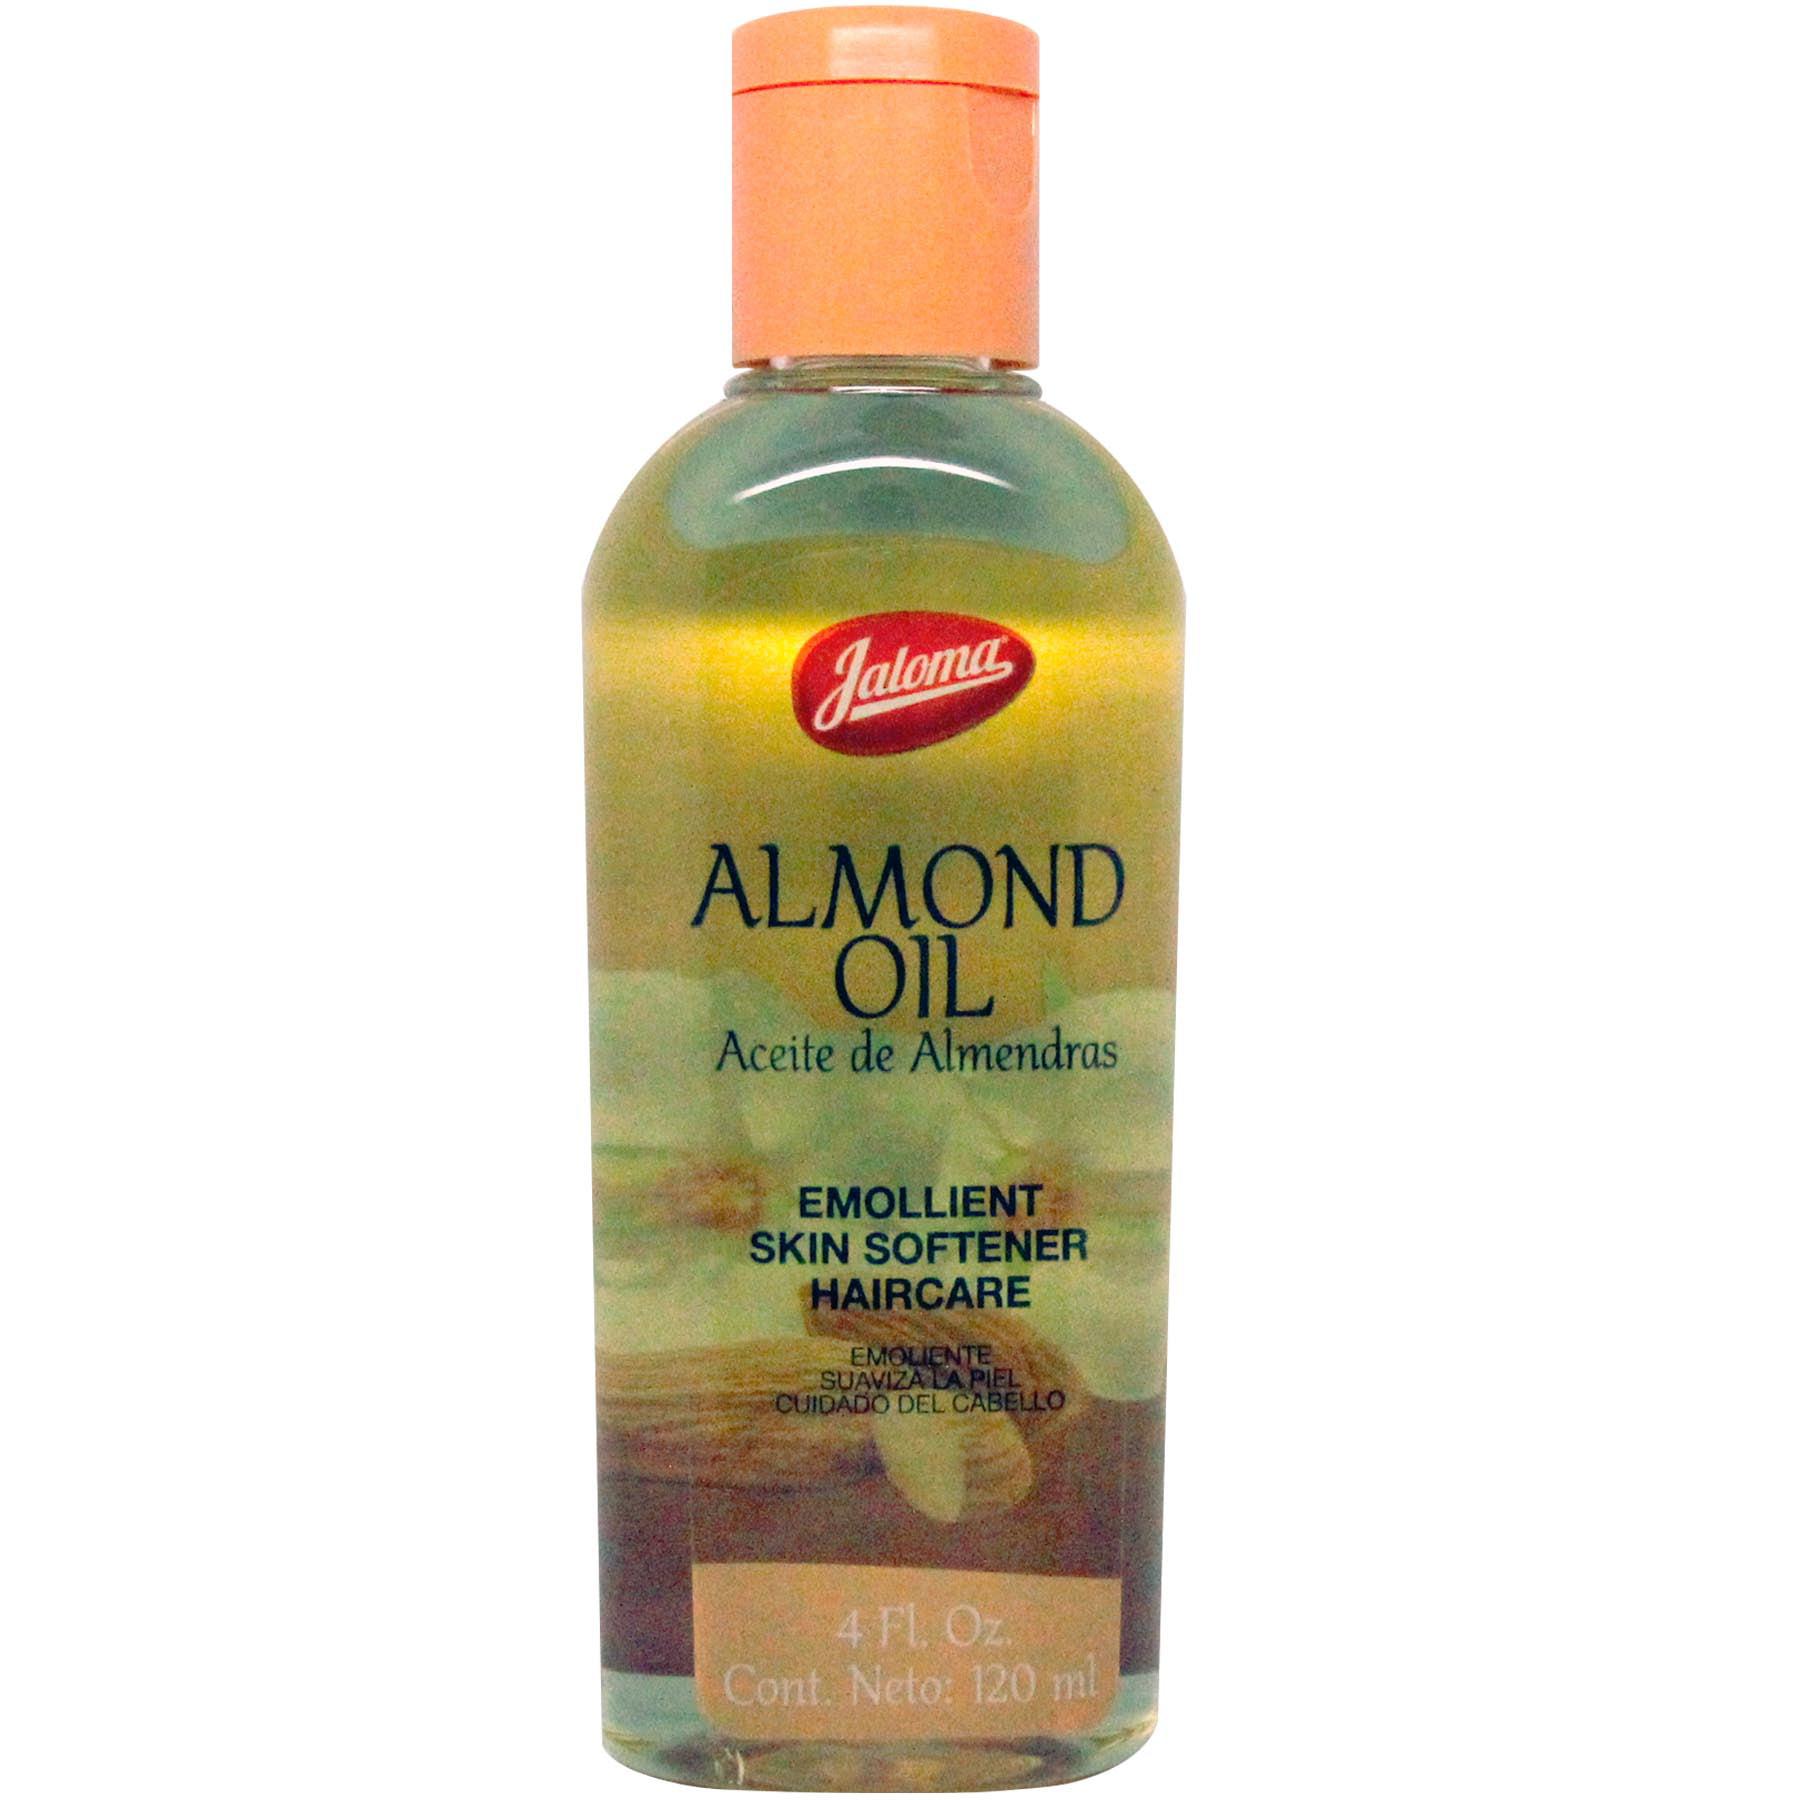 ALMOND OIL WALMART